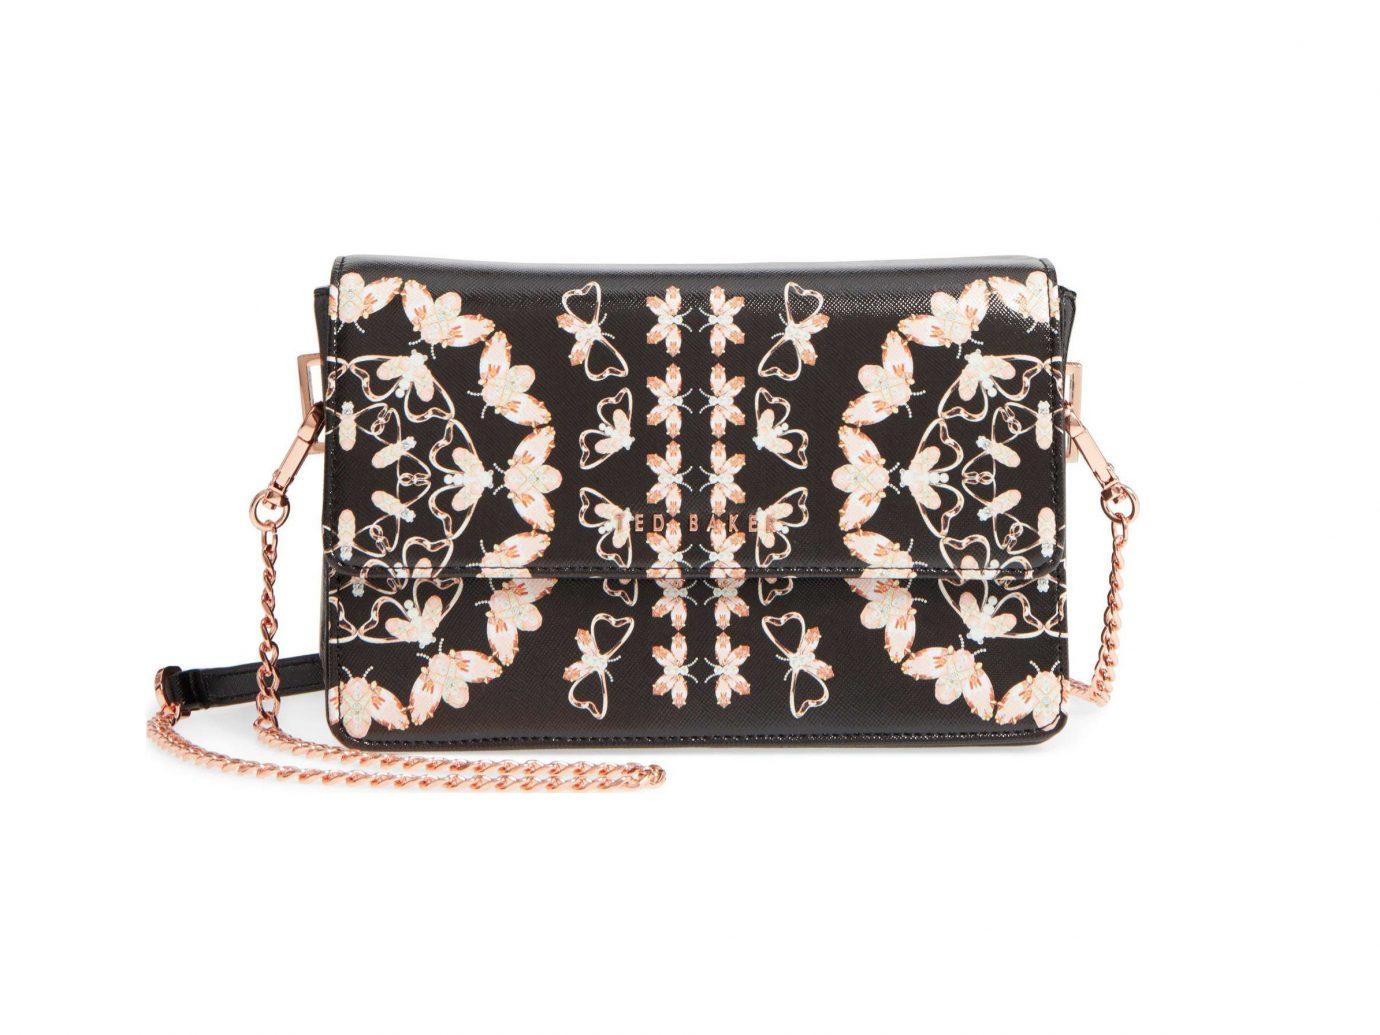 Austria europe Hotels Vienna bag handbag fashion accessory shoulder bag wristlet coin purse font brand pattern product